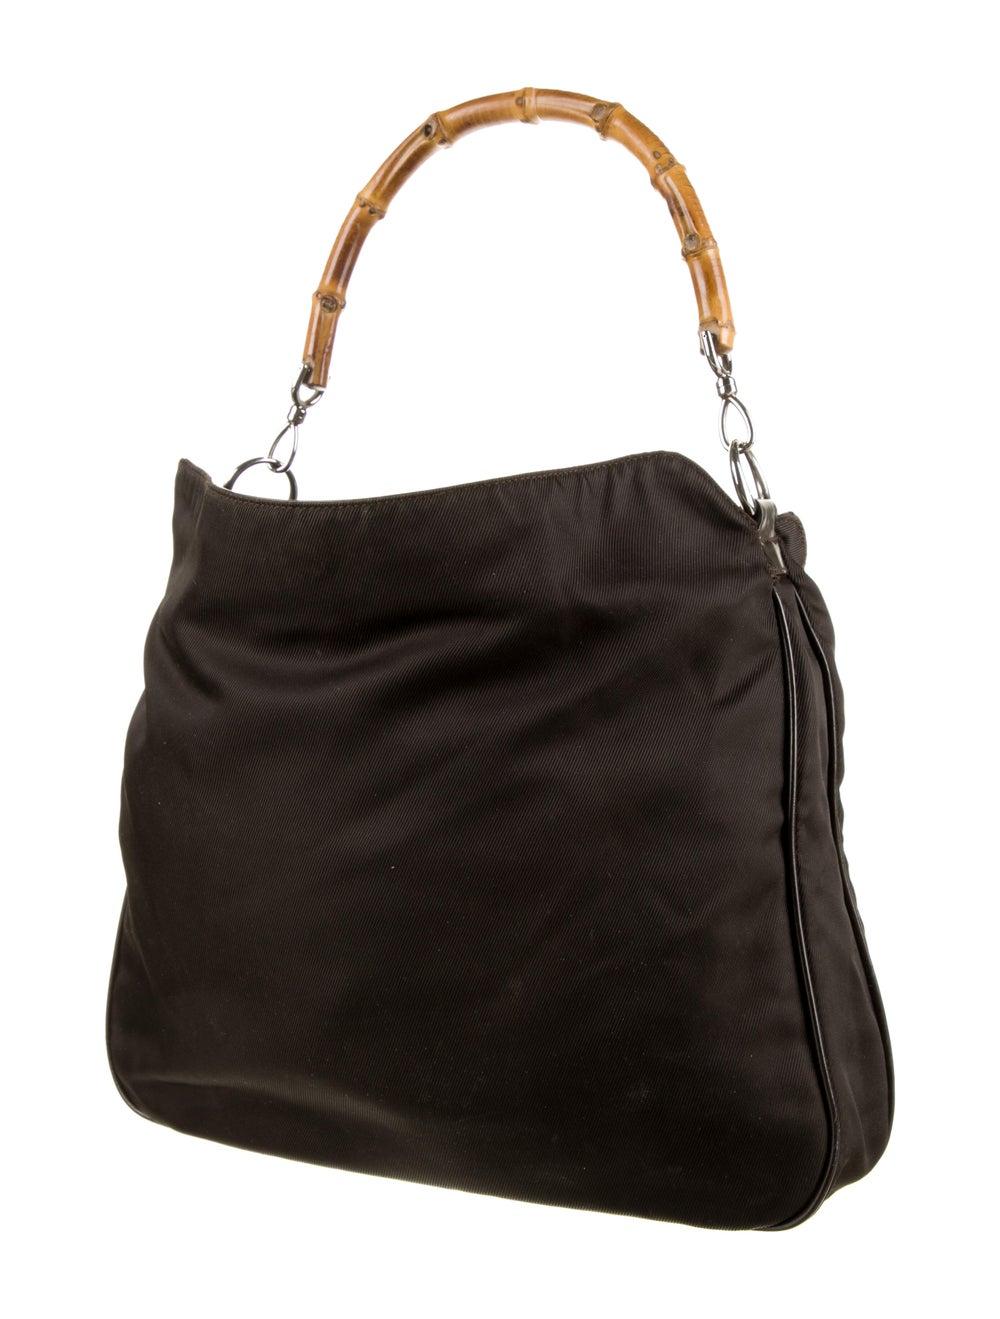 Gucci Vintage Bamboo Handle Bag Brown - image 3